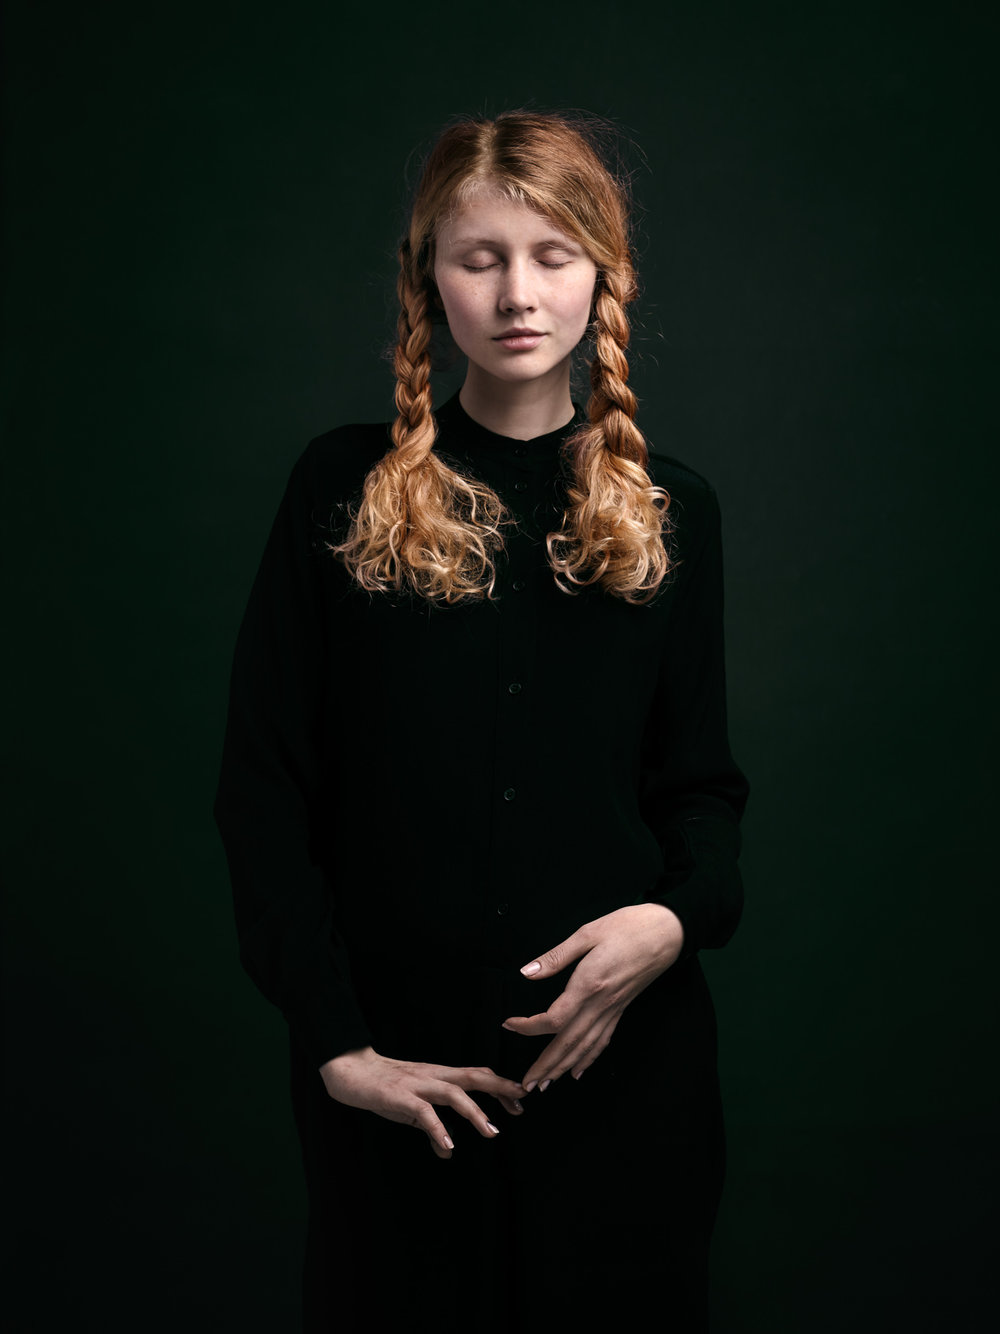 Women-Portraitsnew.jpg